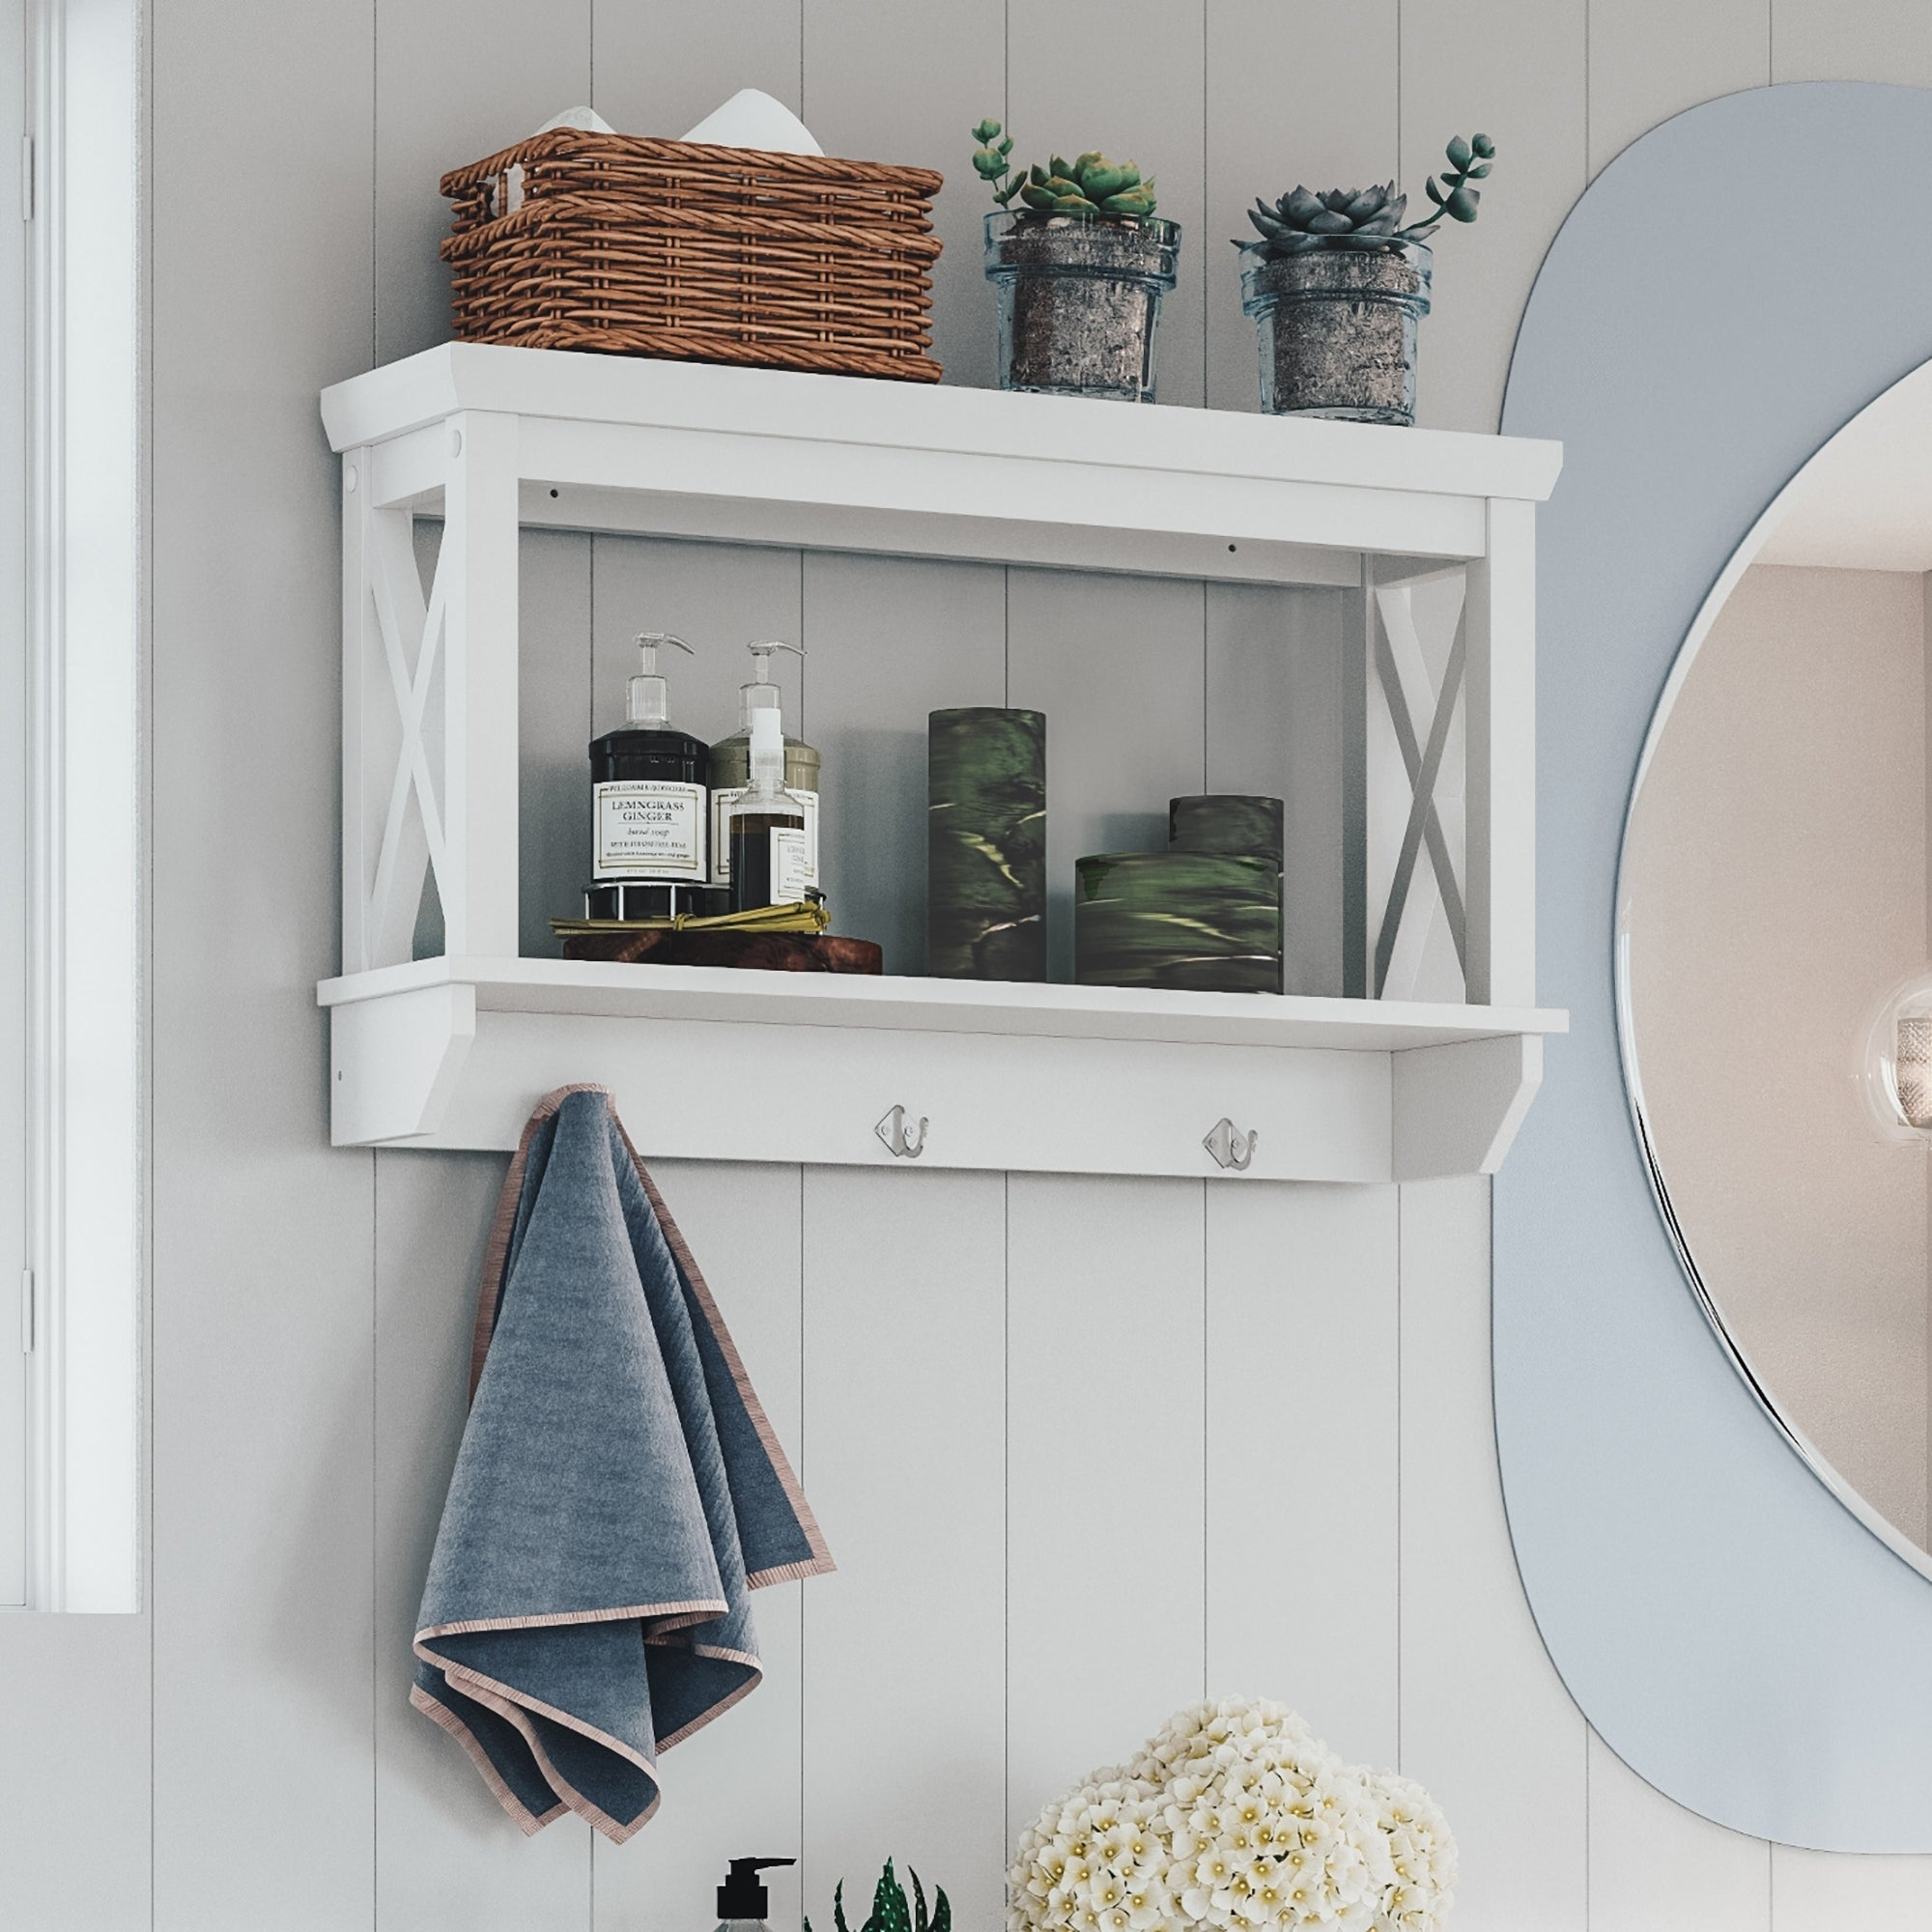 Buy Wood Bathroom Organization & Shelving Online at Overstock.com ...